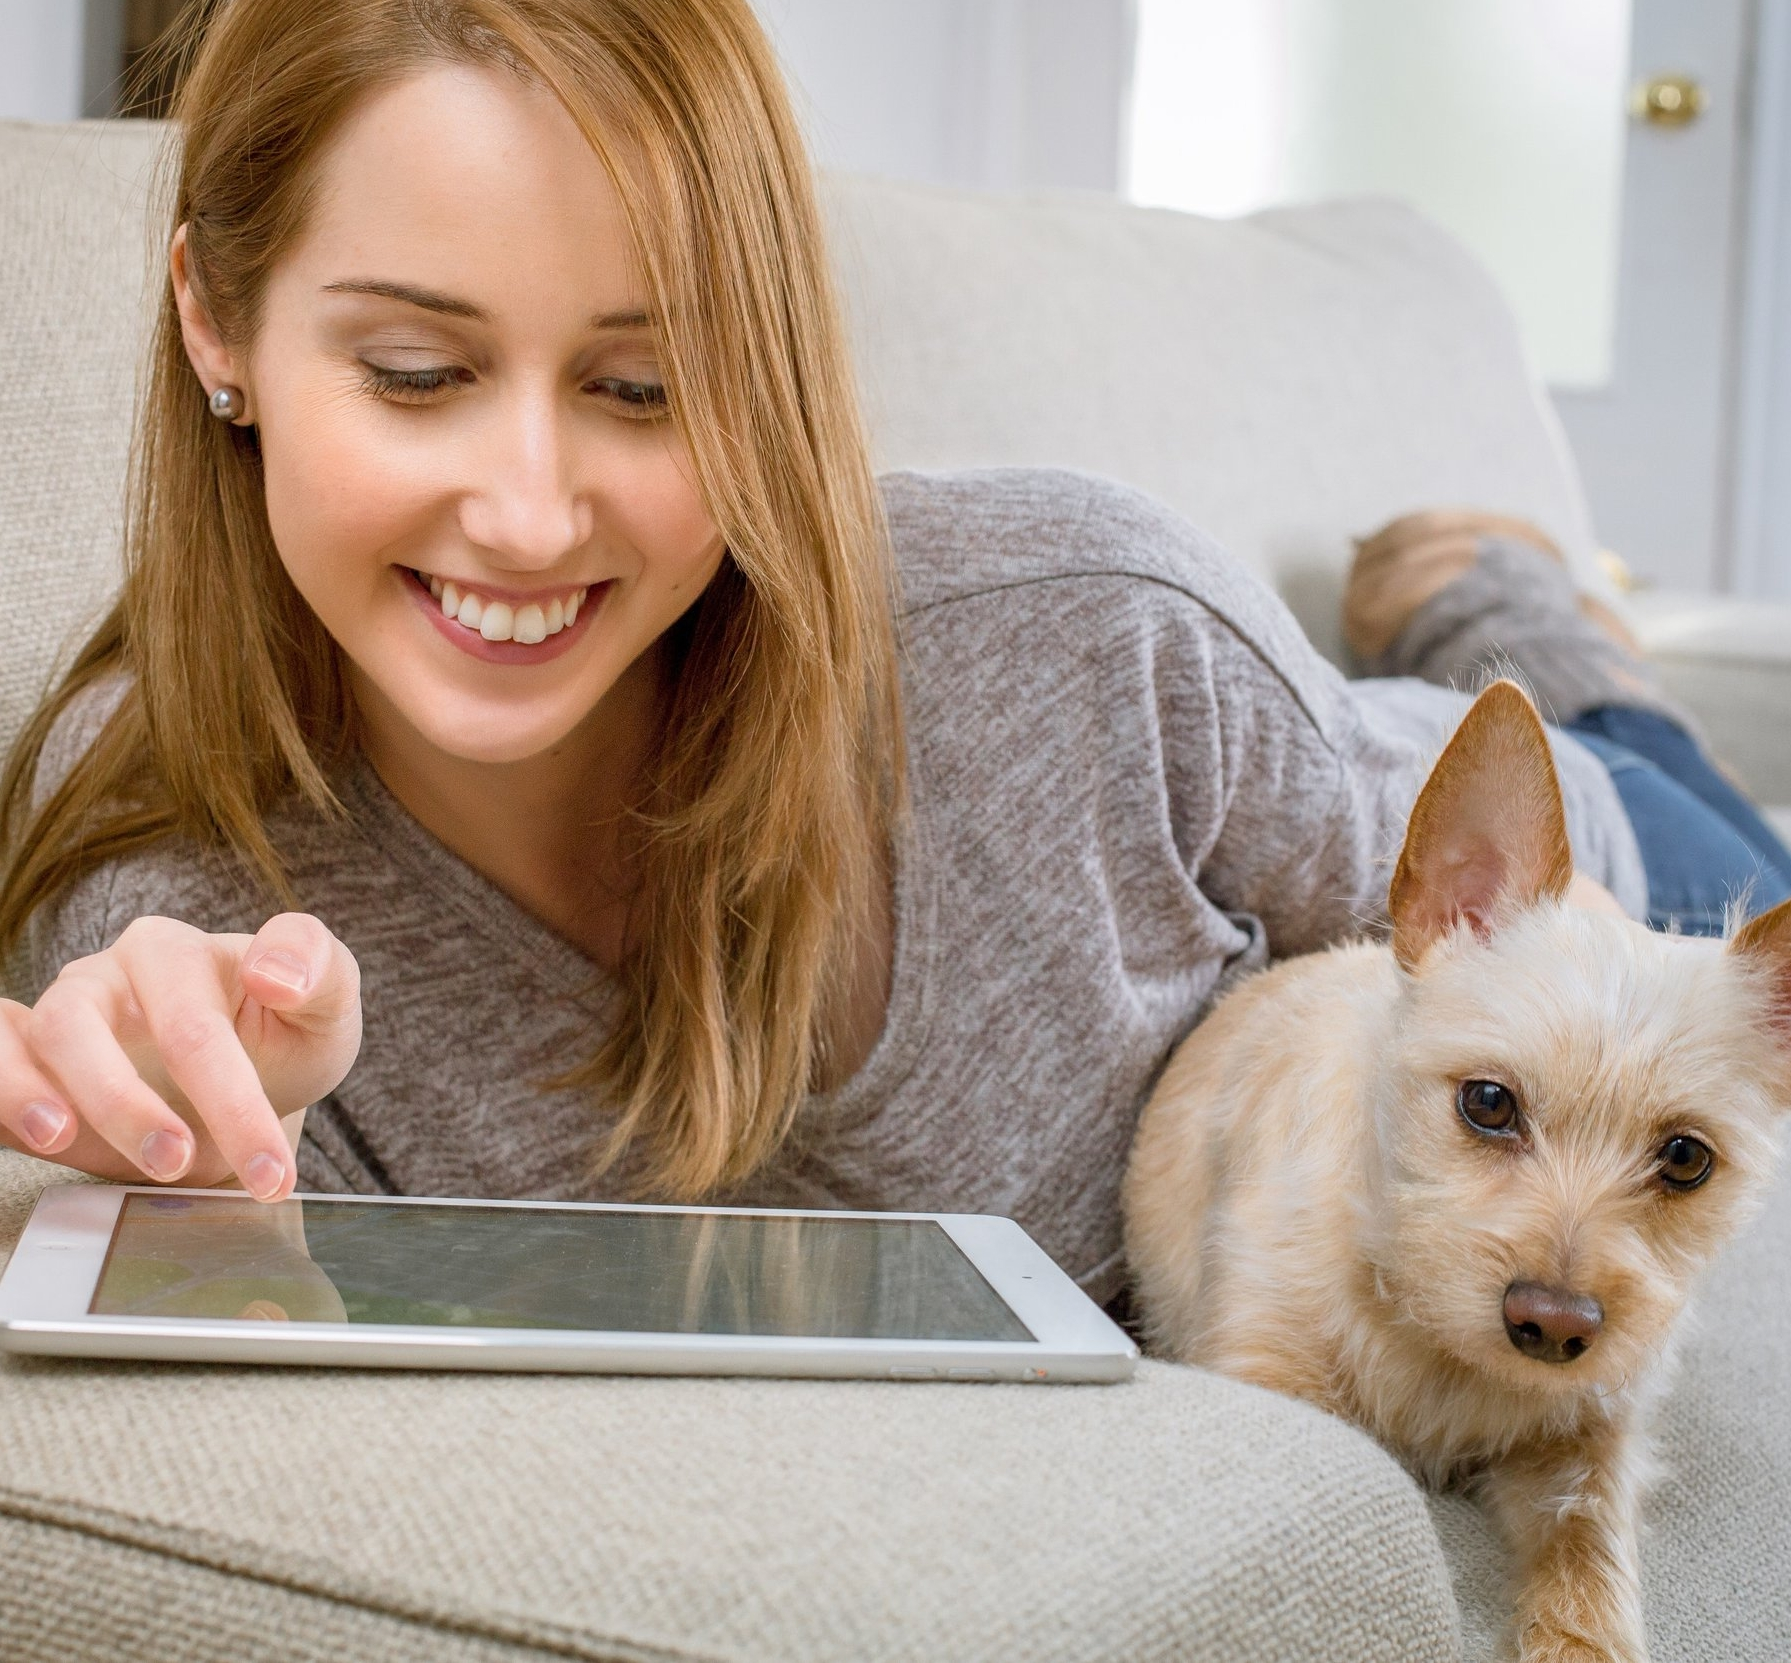 Girl with ipad and dog.jpg